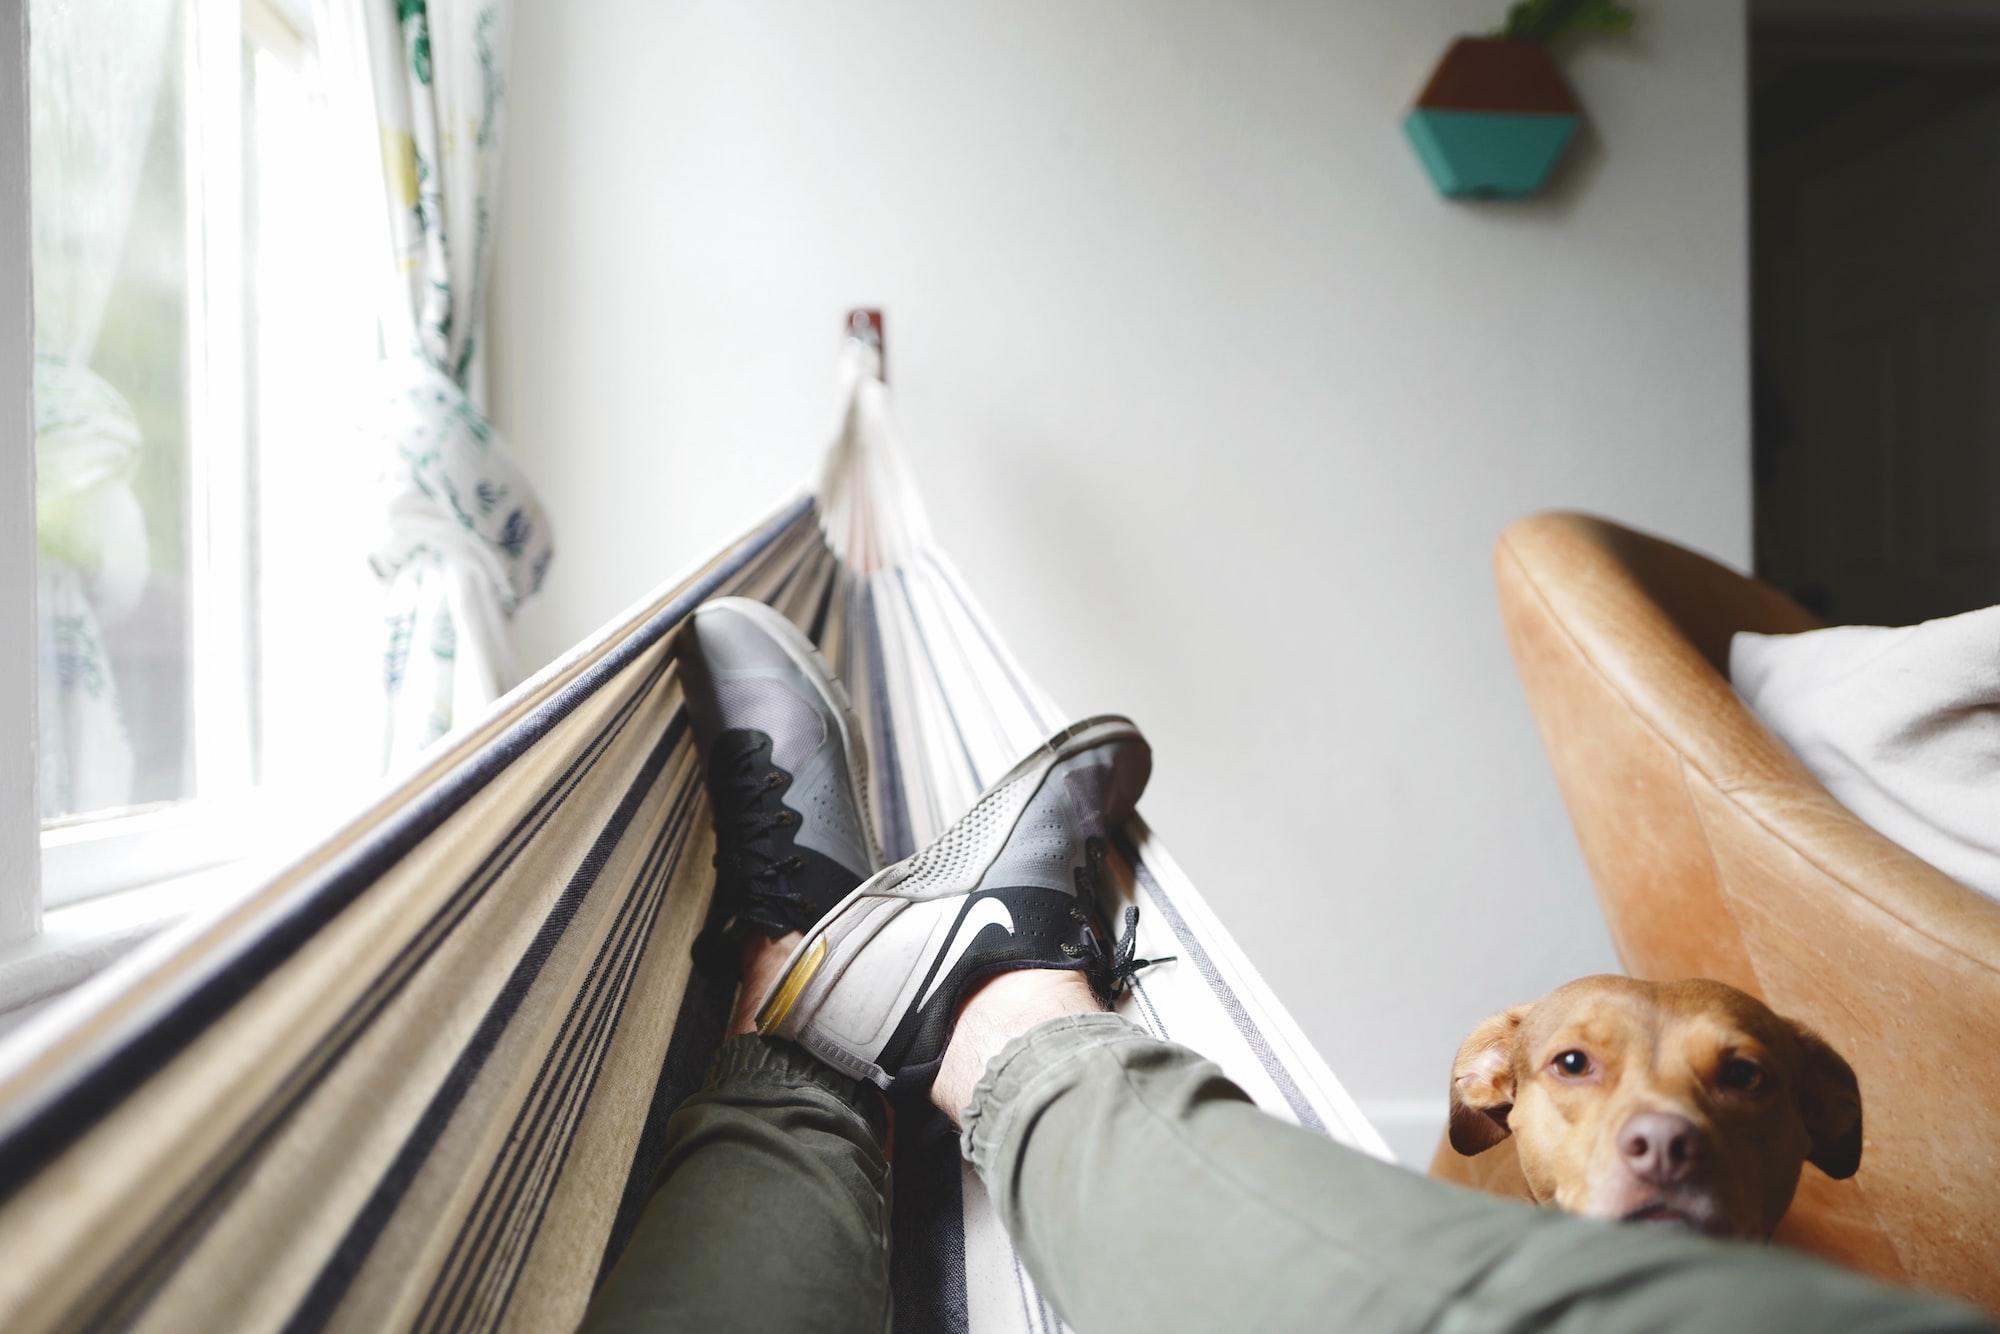 Dog and hammock